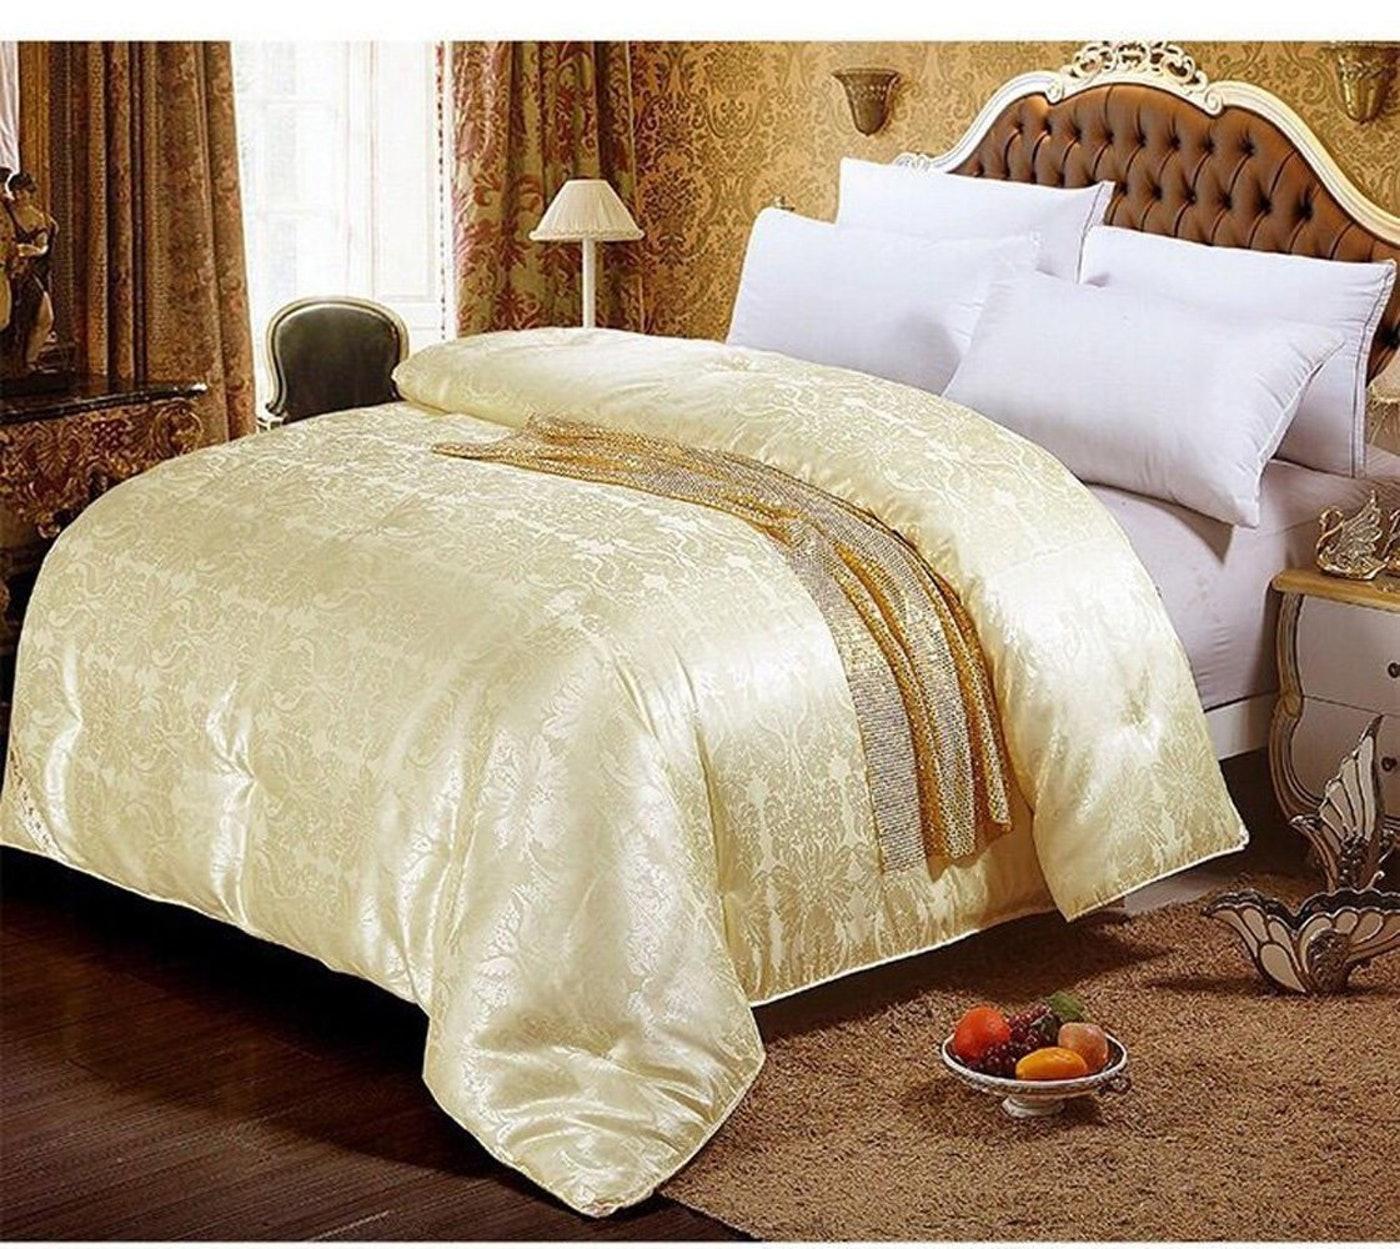 bc94026b35 The 5 Best Silk Comforters